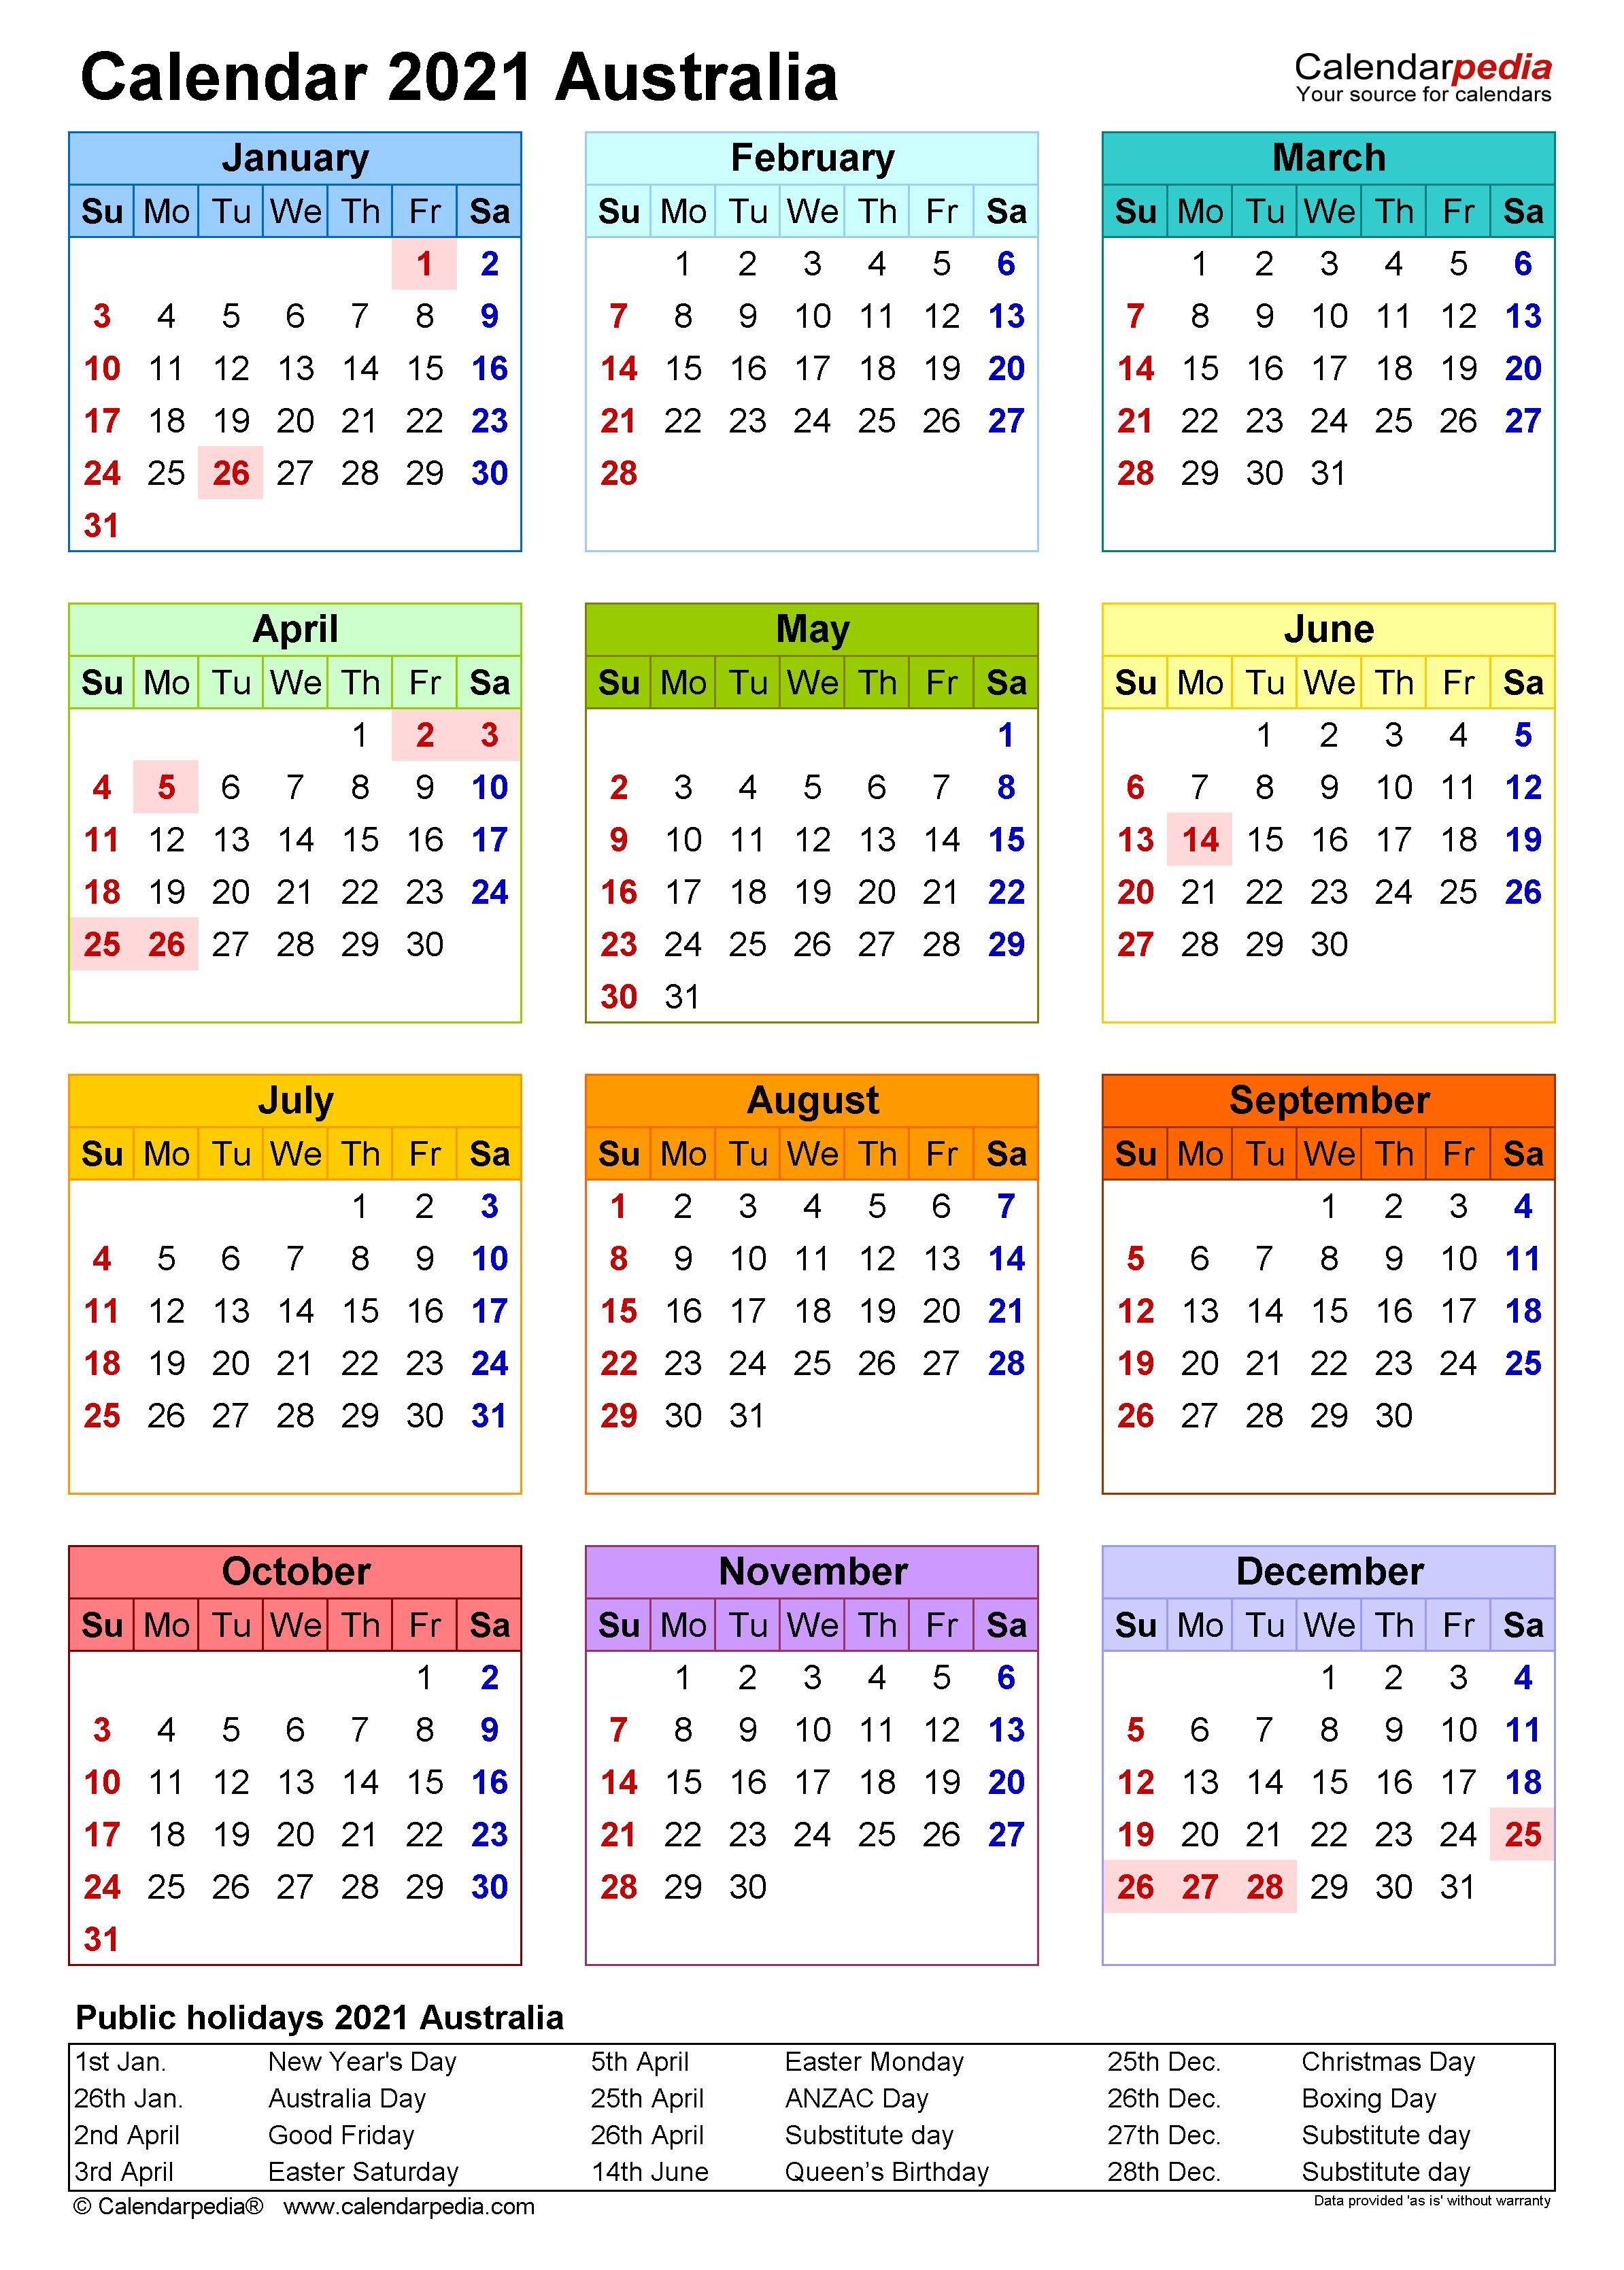 Australia Calendar 2021 - Free Printable Pdf Templates  2020 2021 Financial Calendar Australia